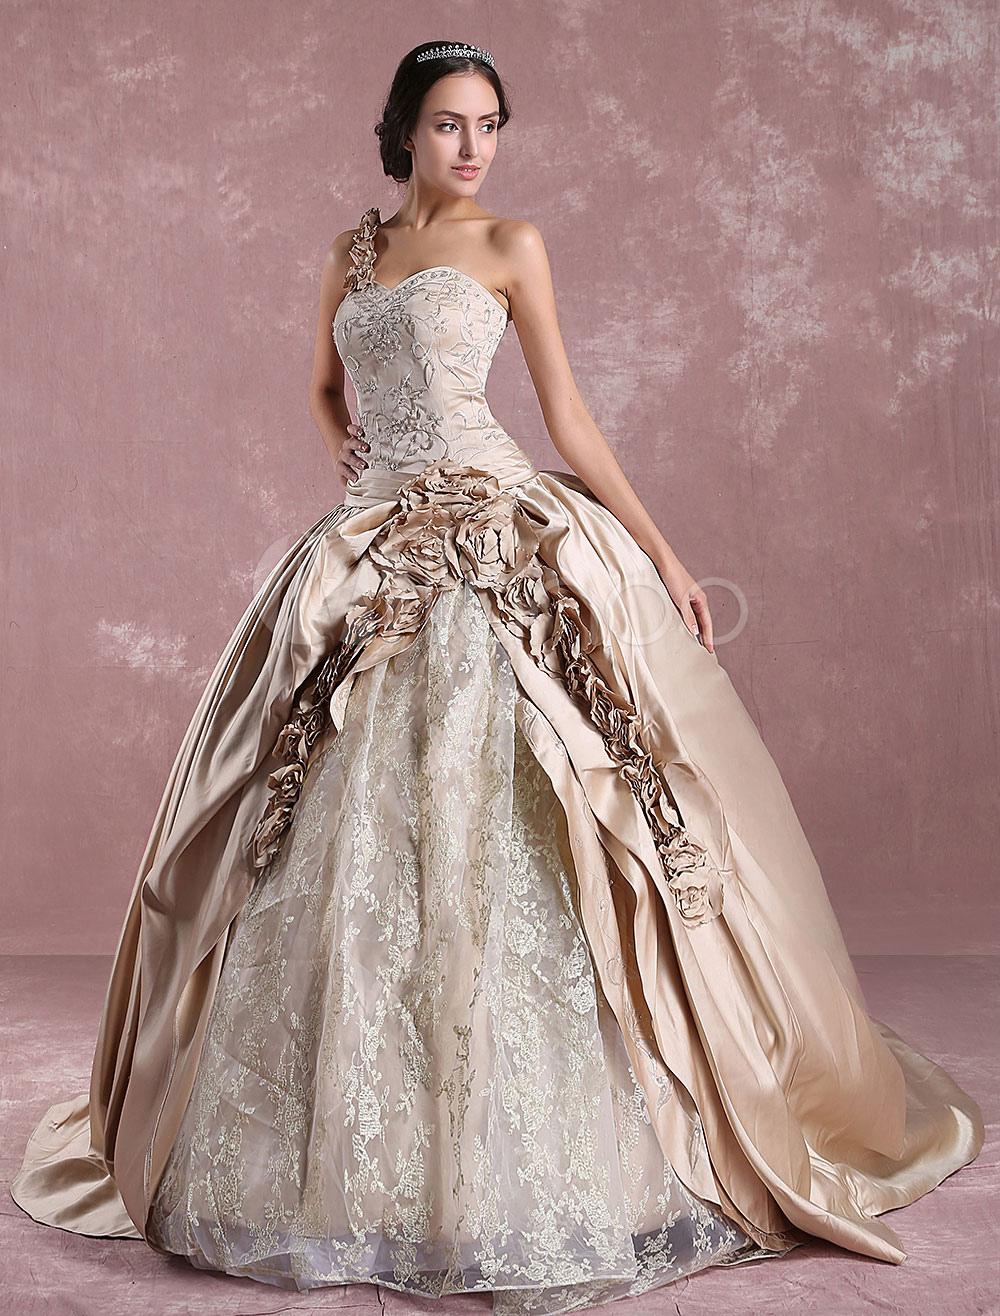 Princess Wedding Dresses Champagne Victoria Bridal Gown